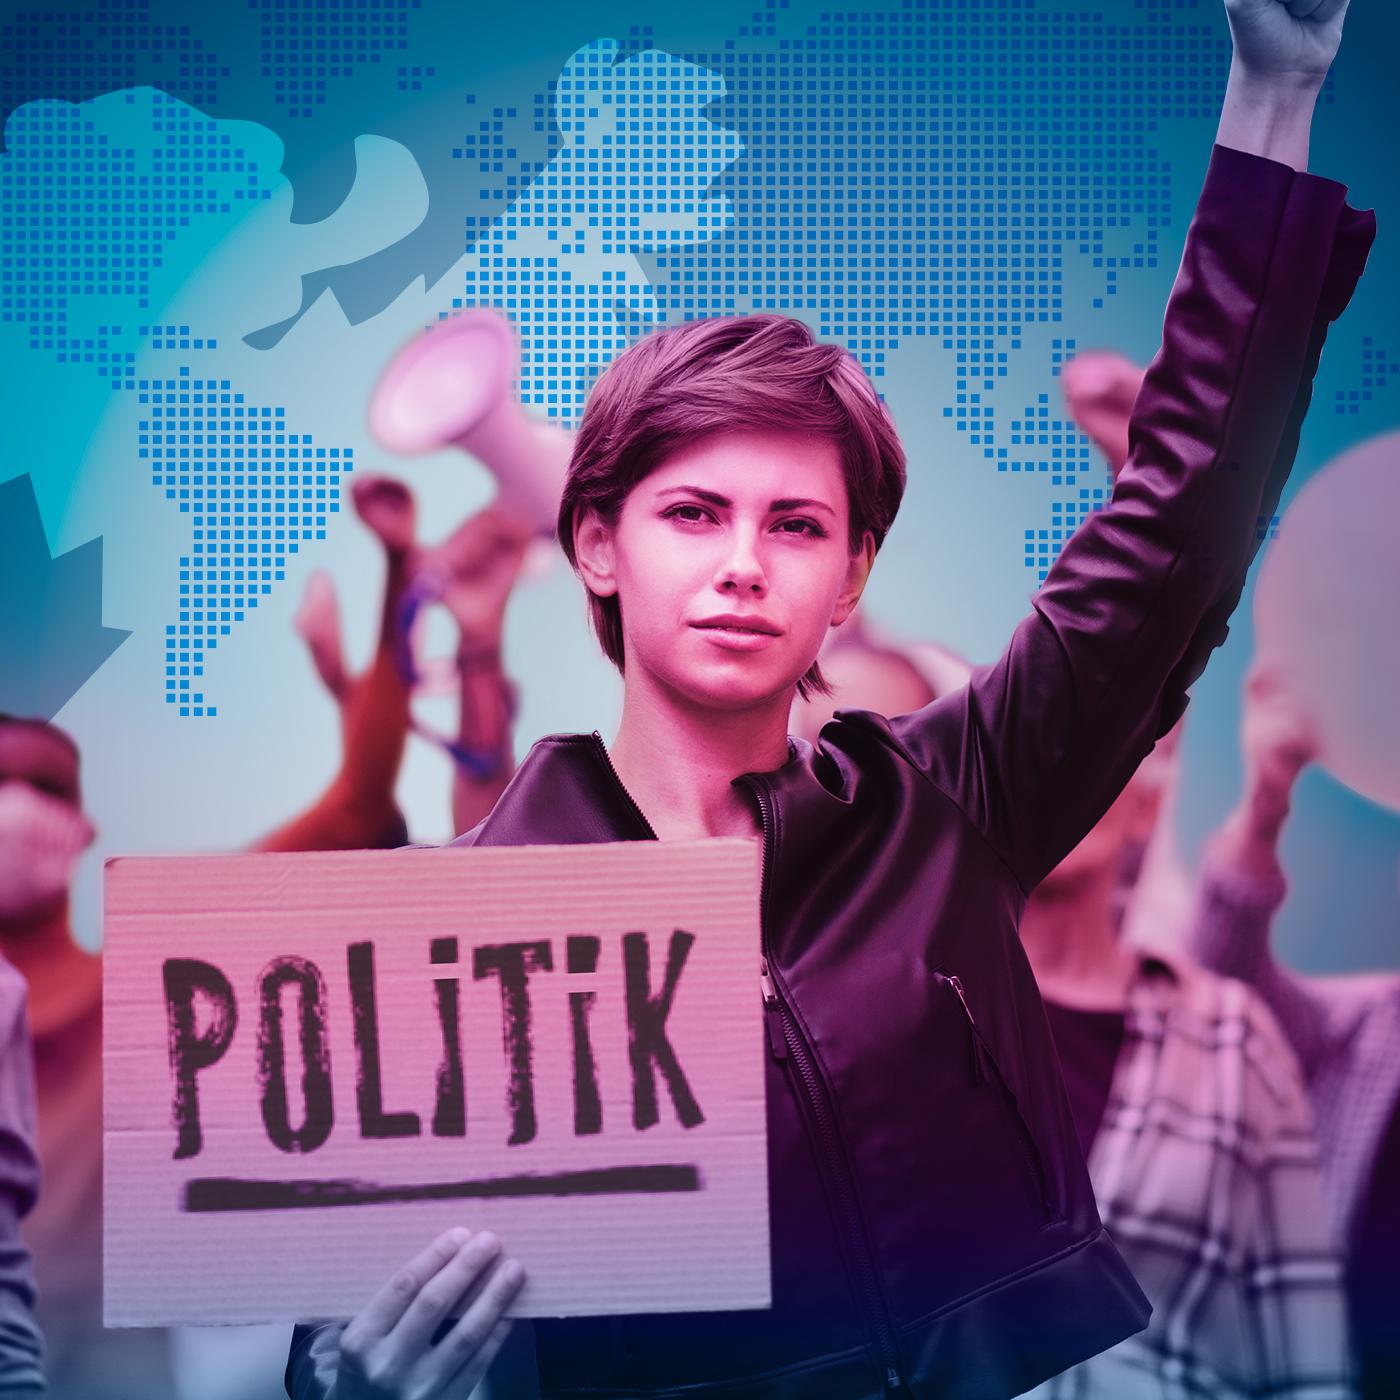 Politik-Podcast-Channelbild